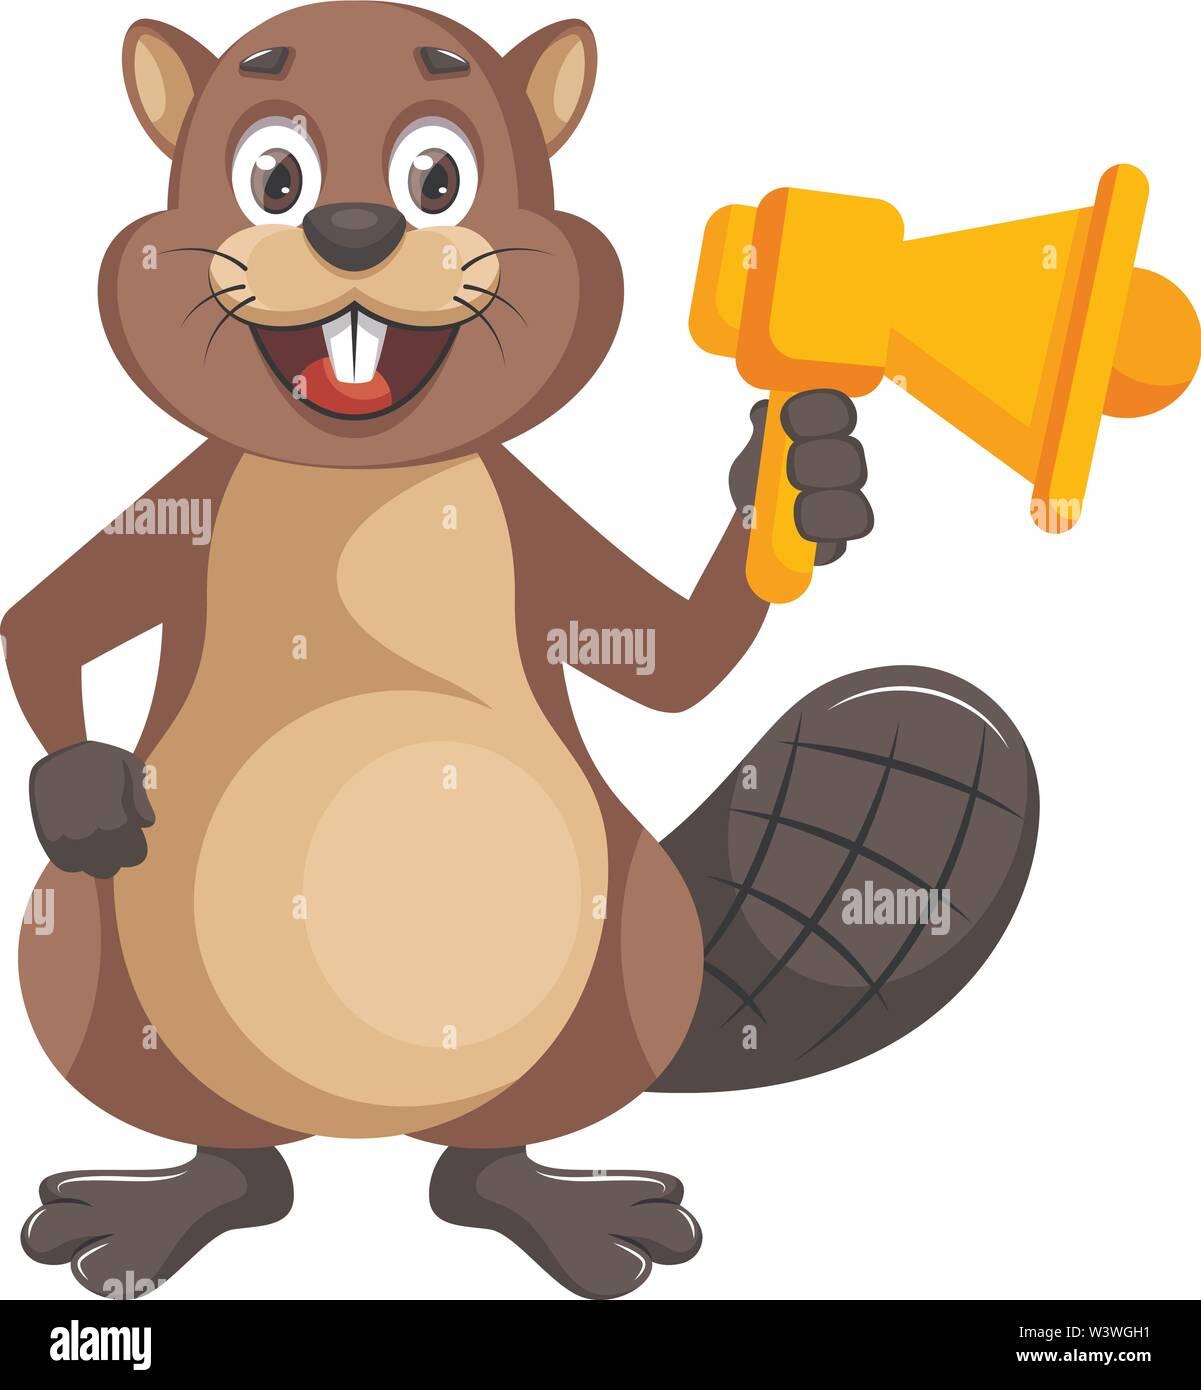 Beaver with megaphone, illustration, vector on white background. - Stock Image